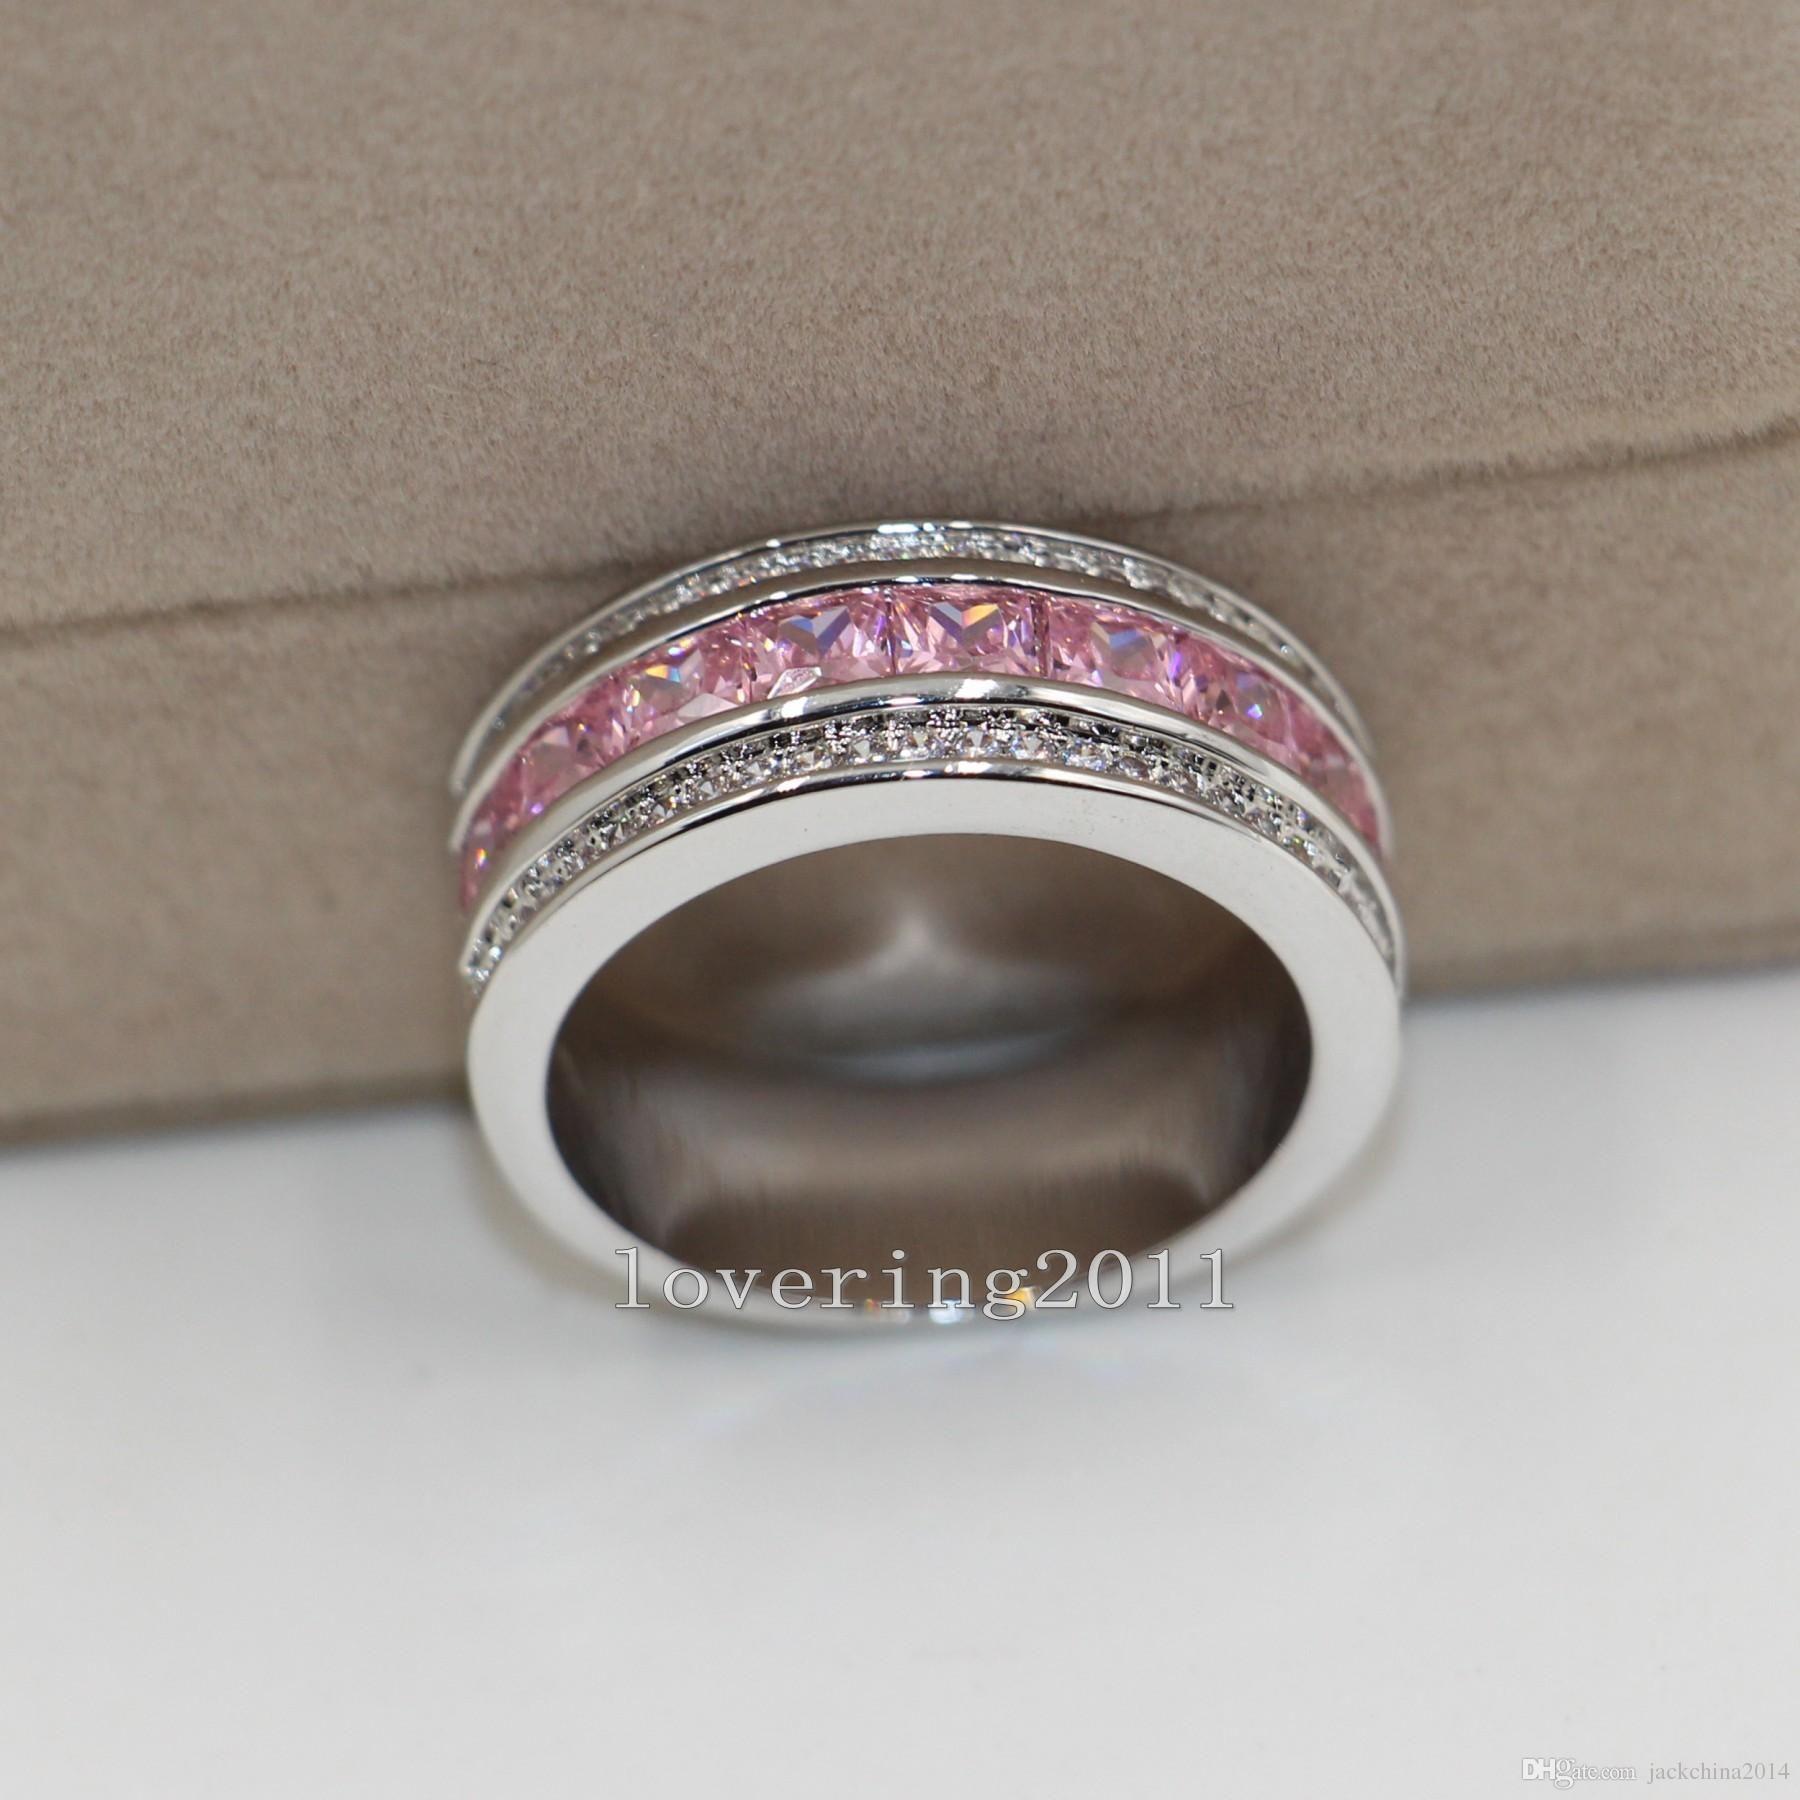 Princesa CUT Luxo Agradável Rosa Safira Diamonique 10KT Branco de Ouro Preenchido Mulheres Simulado Casamento Noivado de Diamante pandora presente Anel Sz5-11